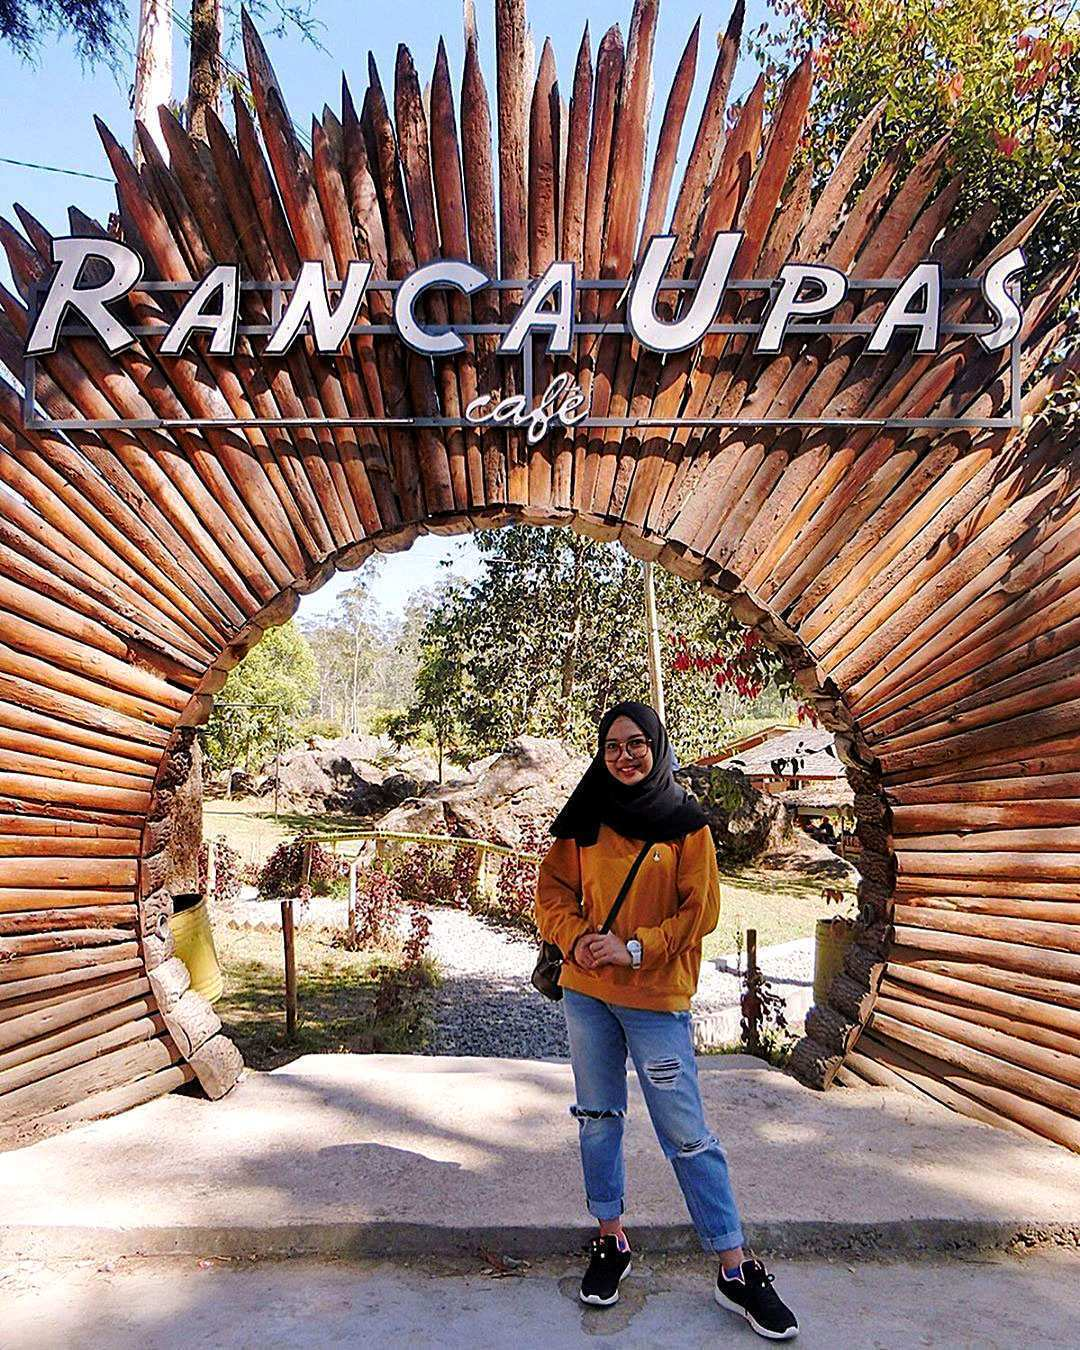 Berfoto di Depan Ranca Upas Cafe Image From @ristianii98